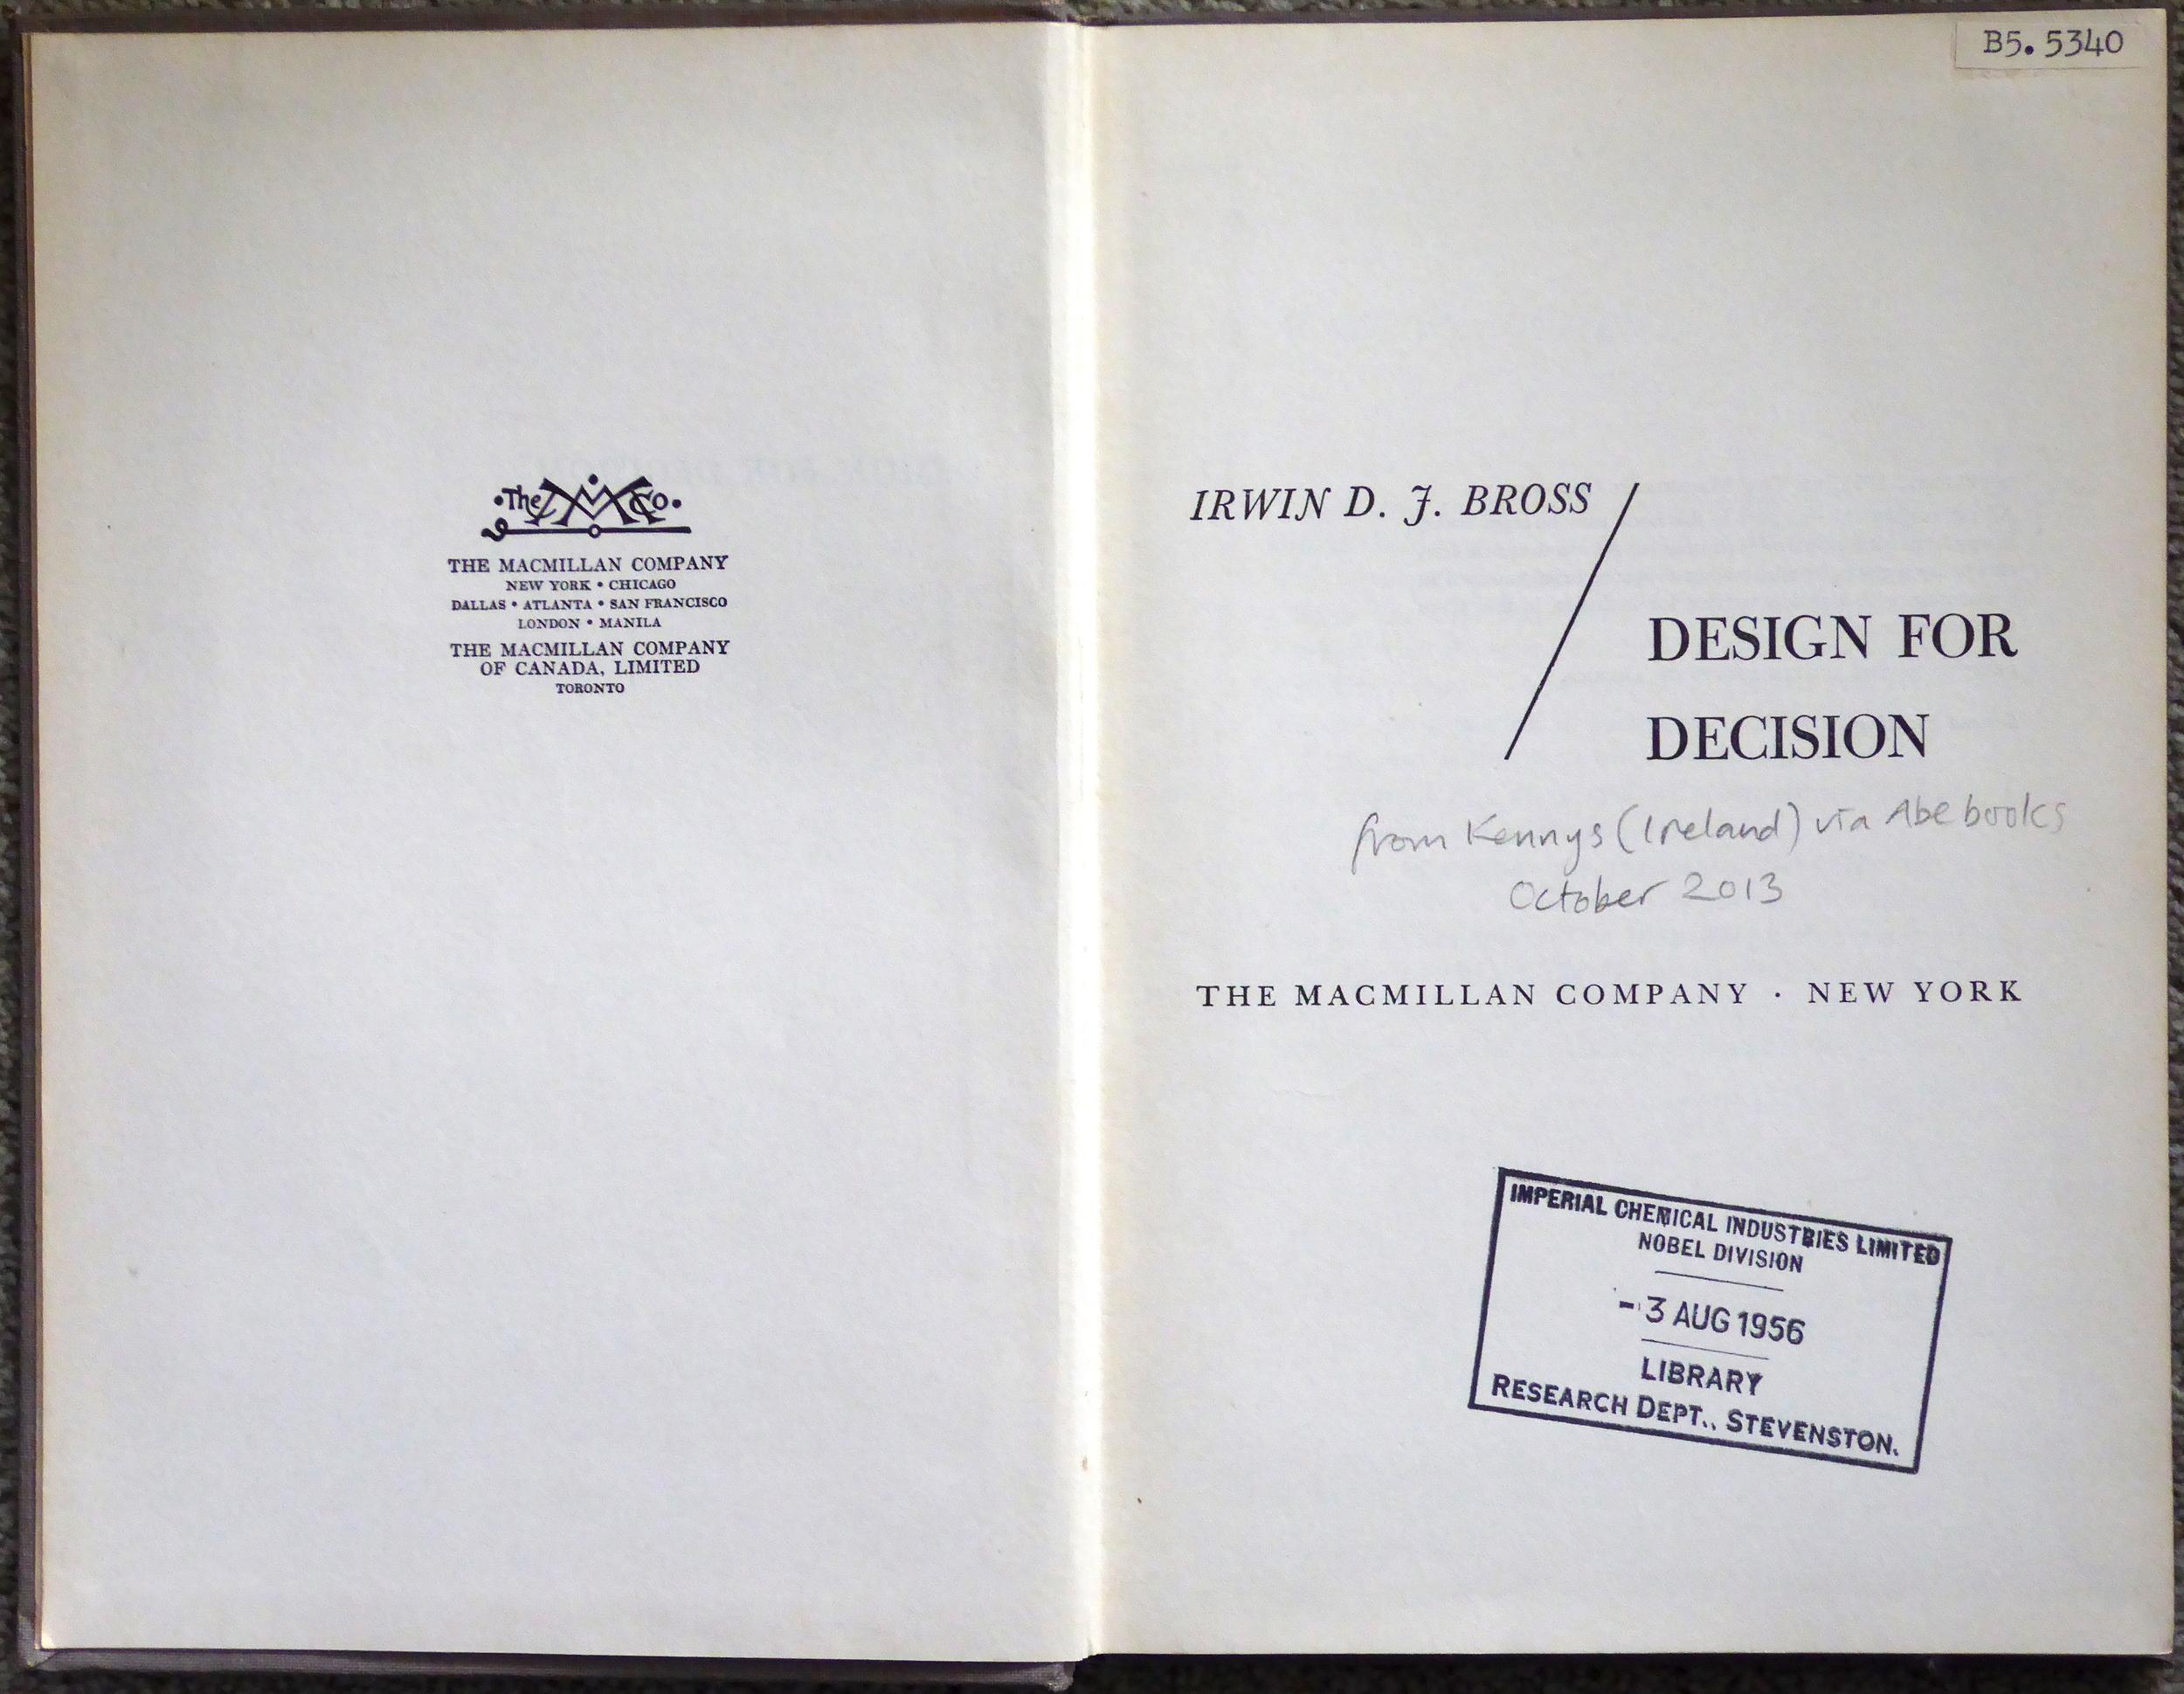 DDR_P1010064_Bross_DesignForDecision.JPG